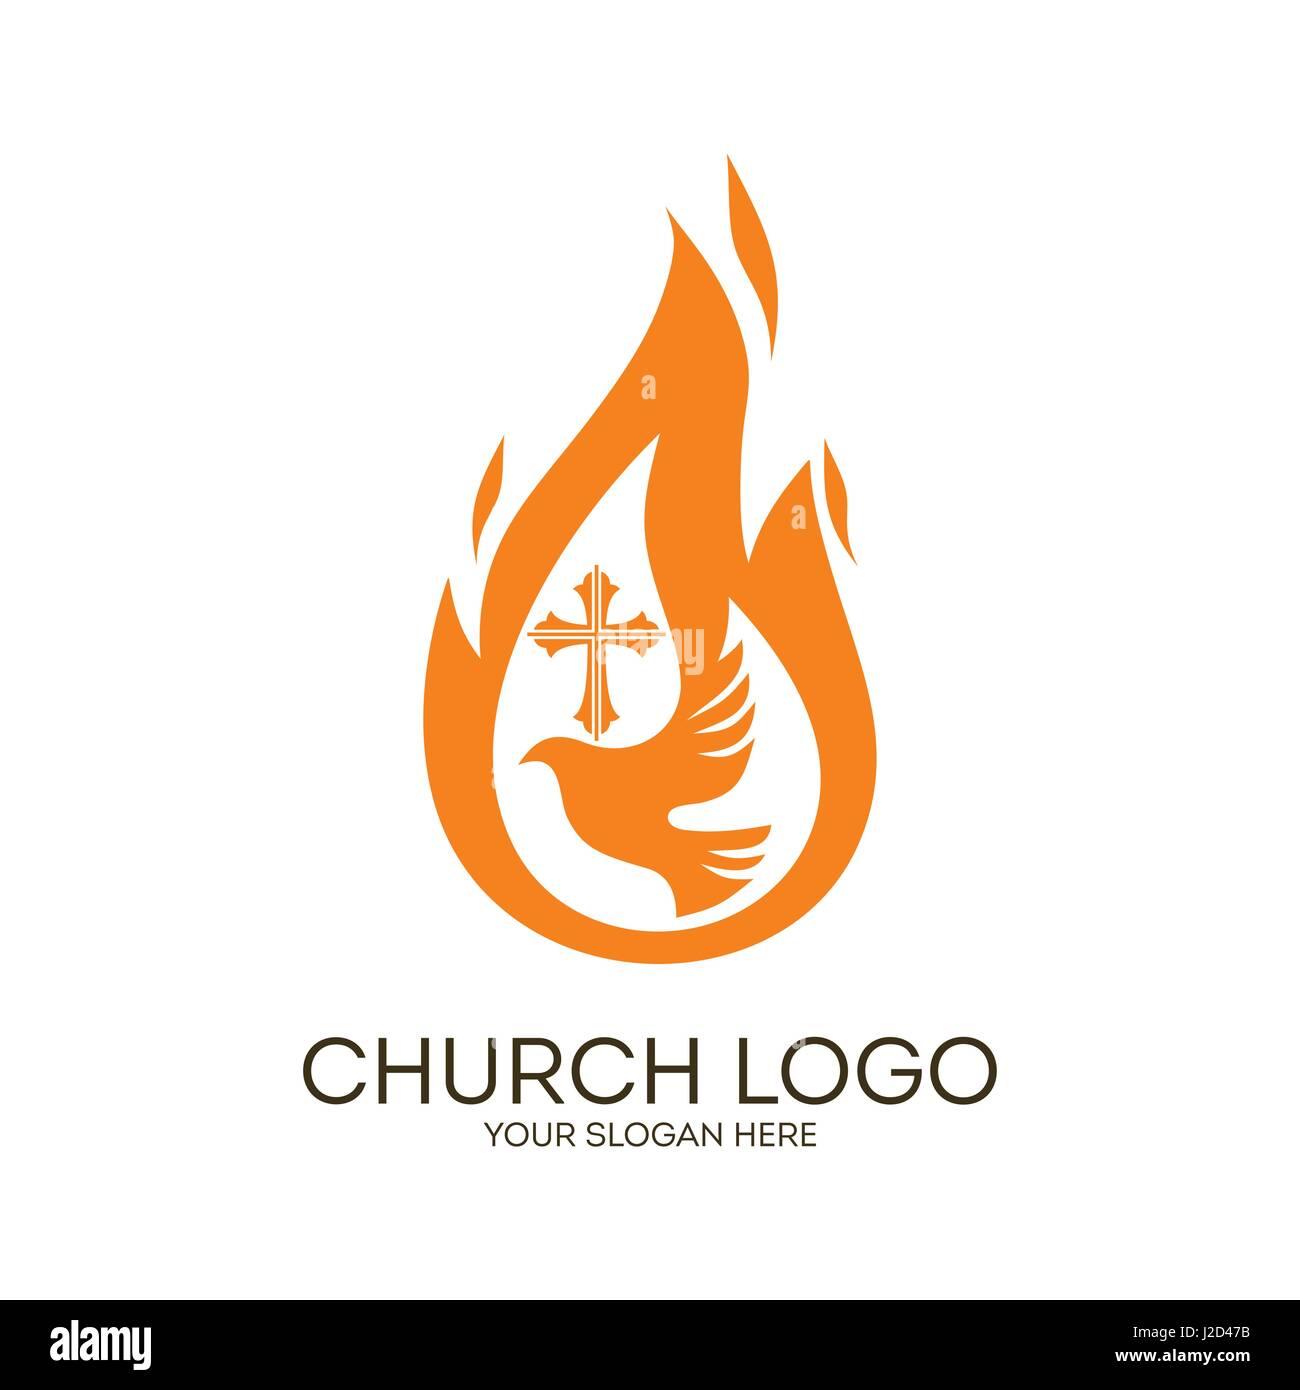 Church logo christian symbols dove the flame of the holy spirit christian symbols dove the flame of the holy spirit and the cross of jesus biocorpaavc